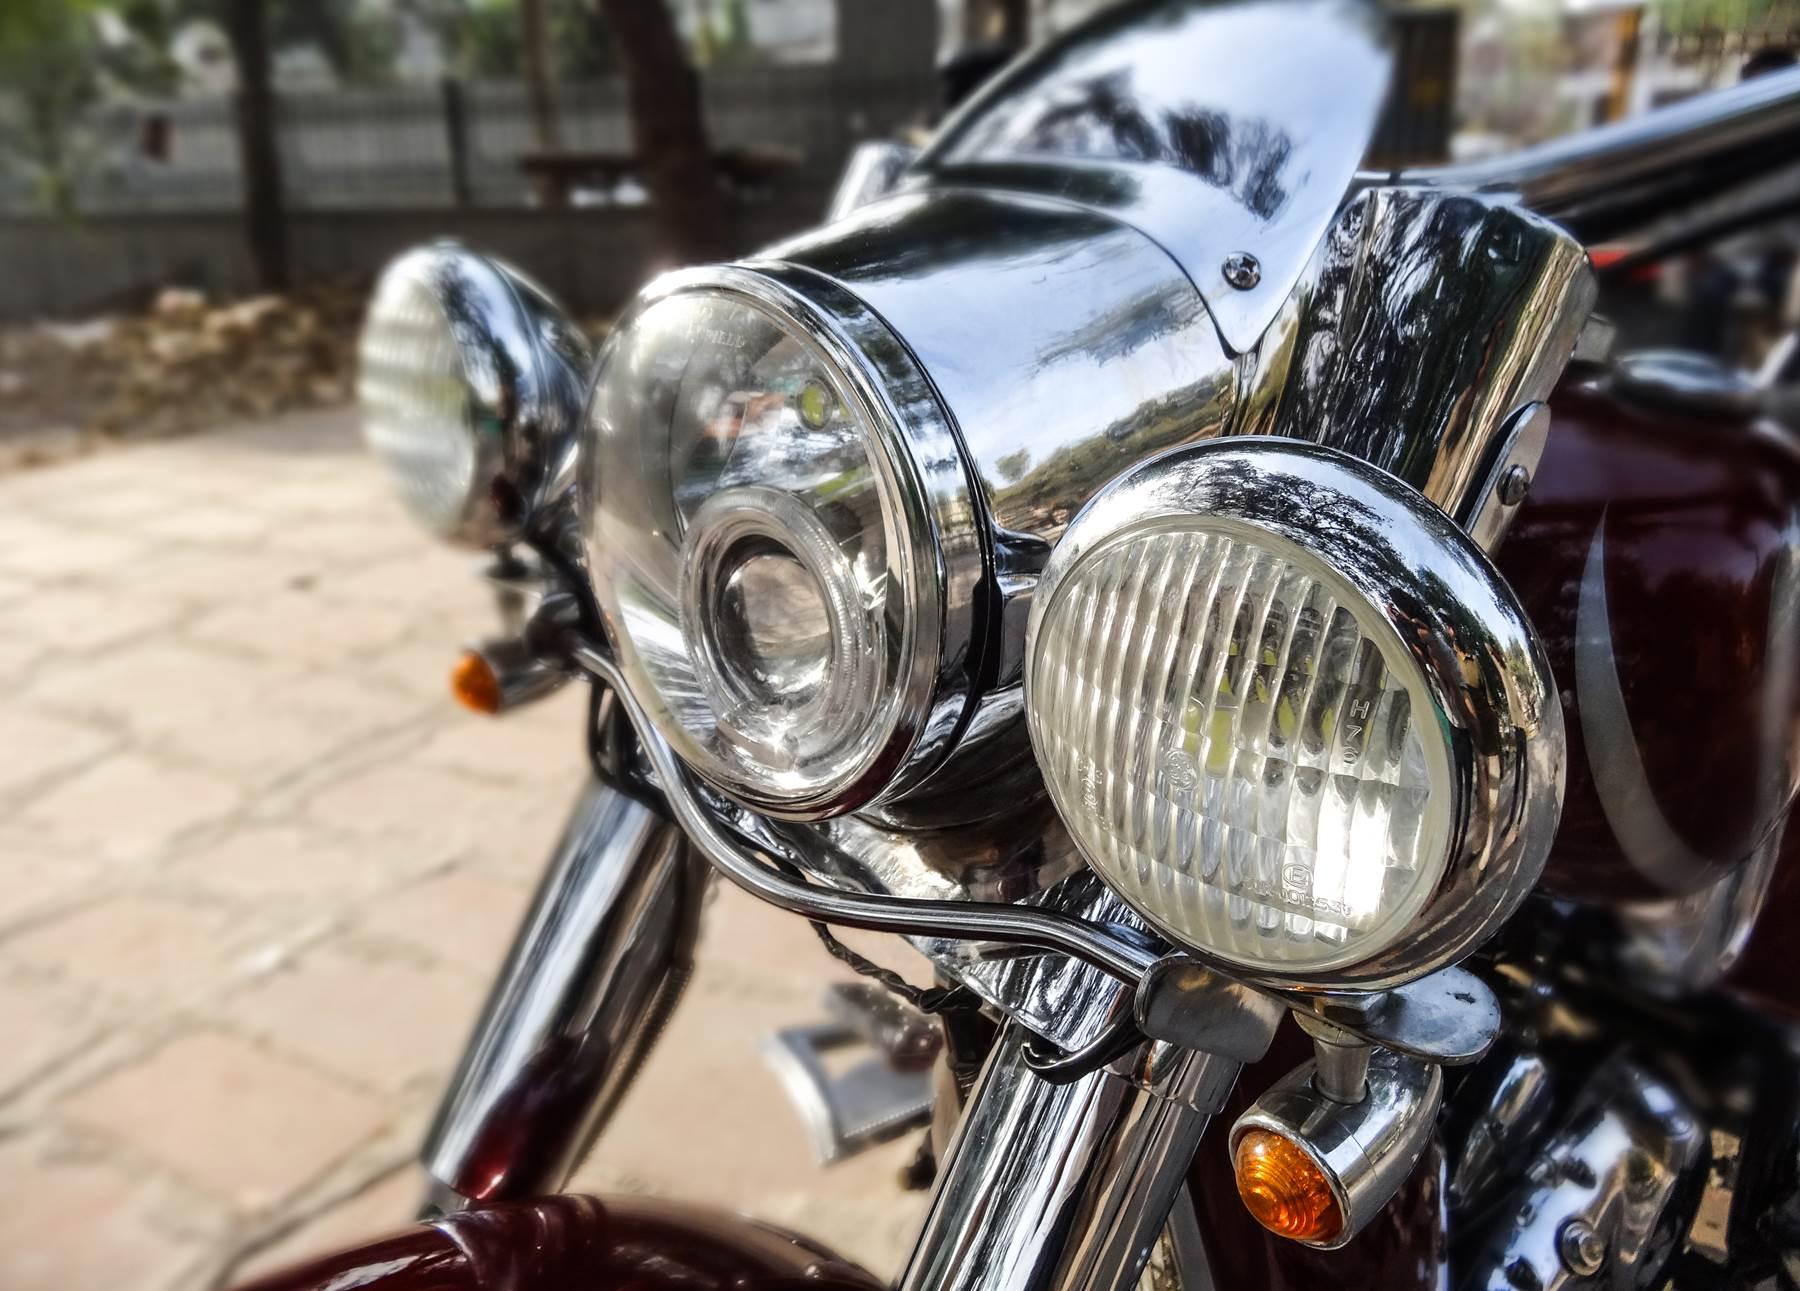 Chopped-Royal-Enfield-Classic-by-Neev-Motorcycles-CC-com-wallpaper-wp4805251